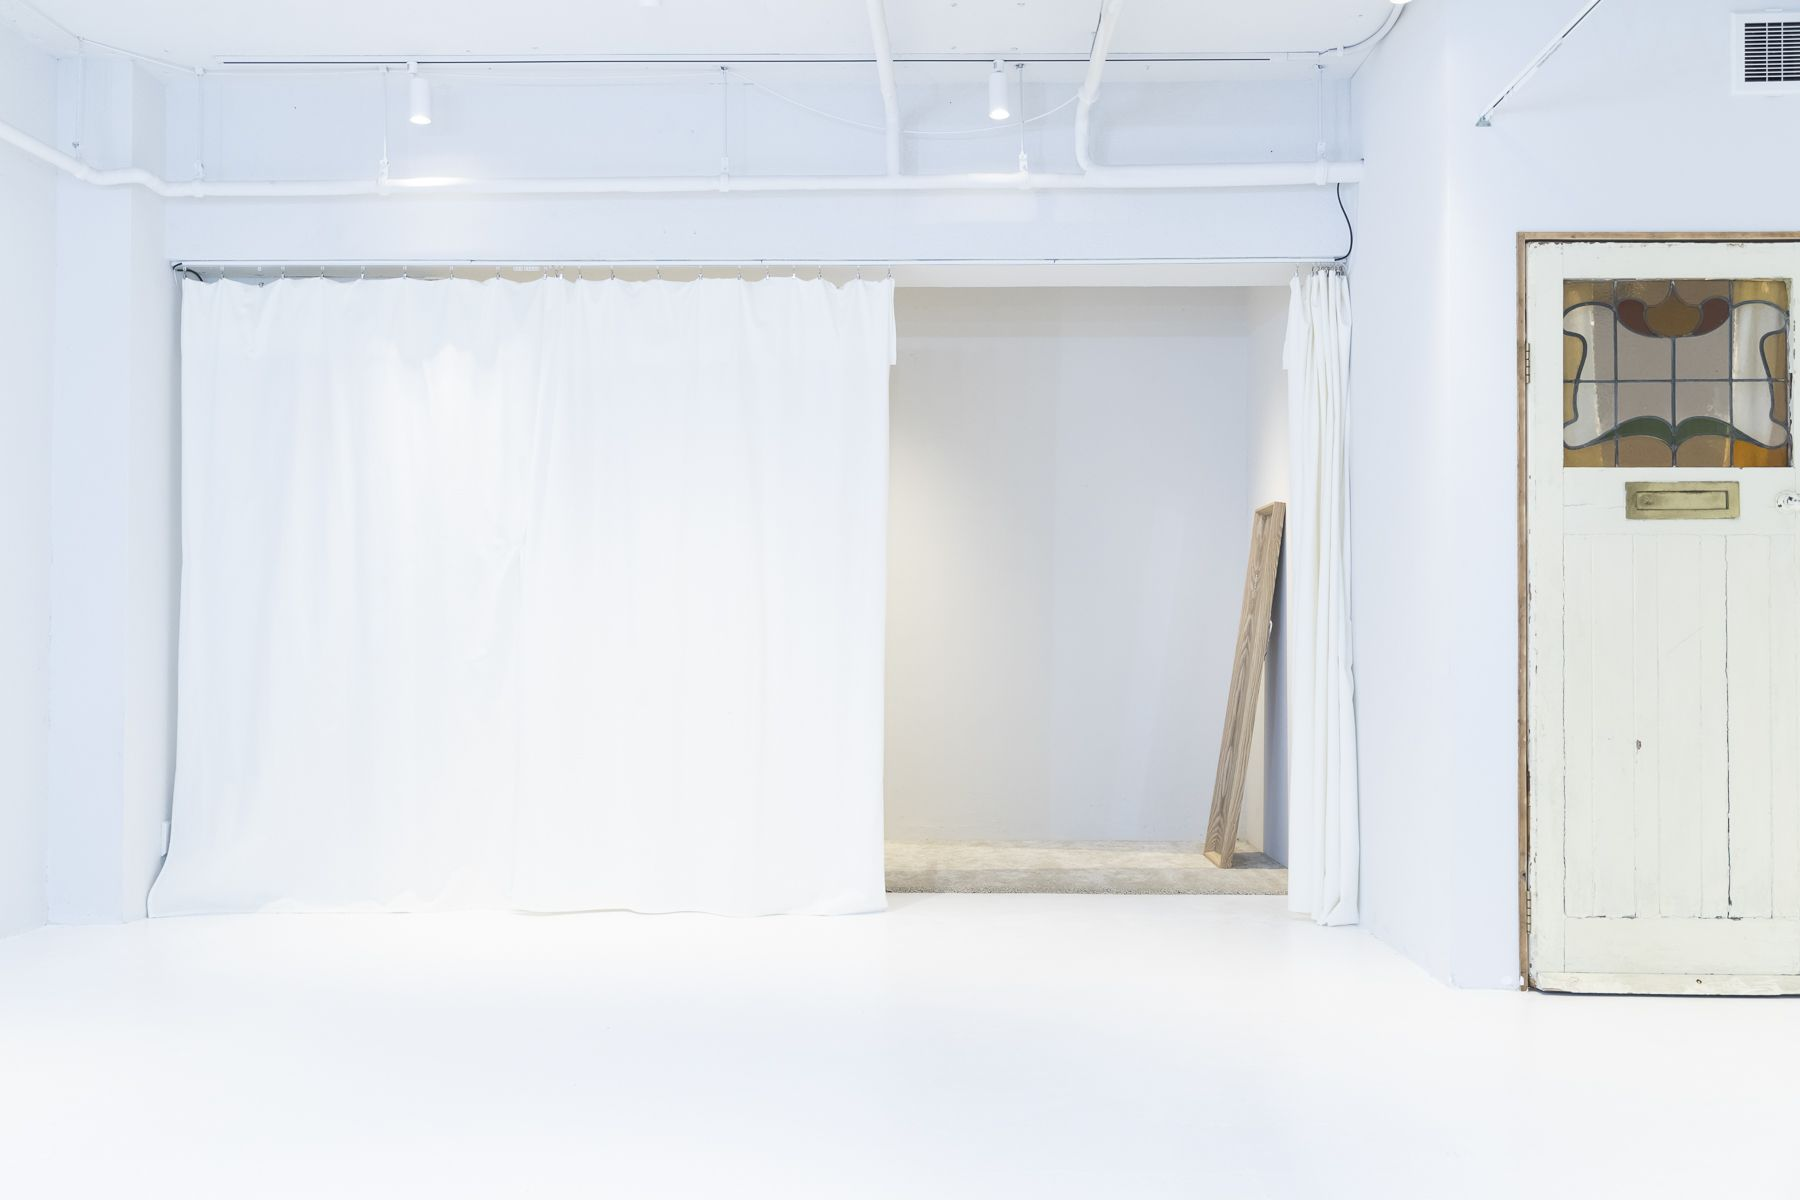 STUDIO SAND 3F~4F (スタジオサンド3F〜4F)B1F 控室としてもご利用可